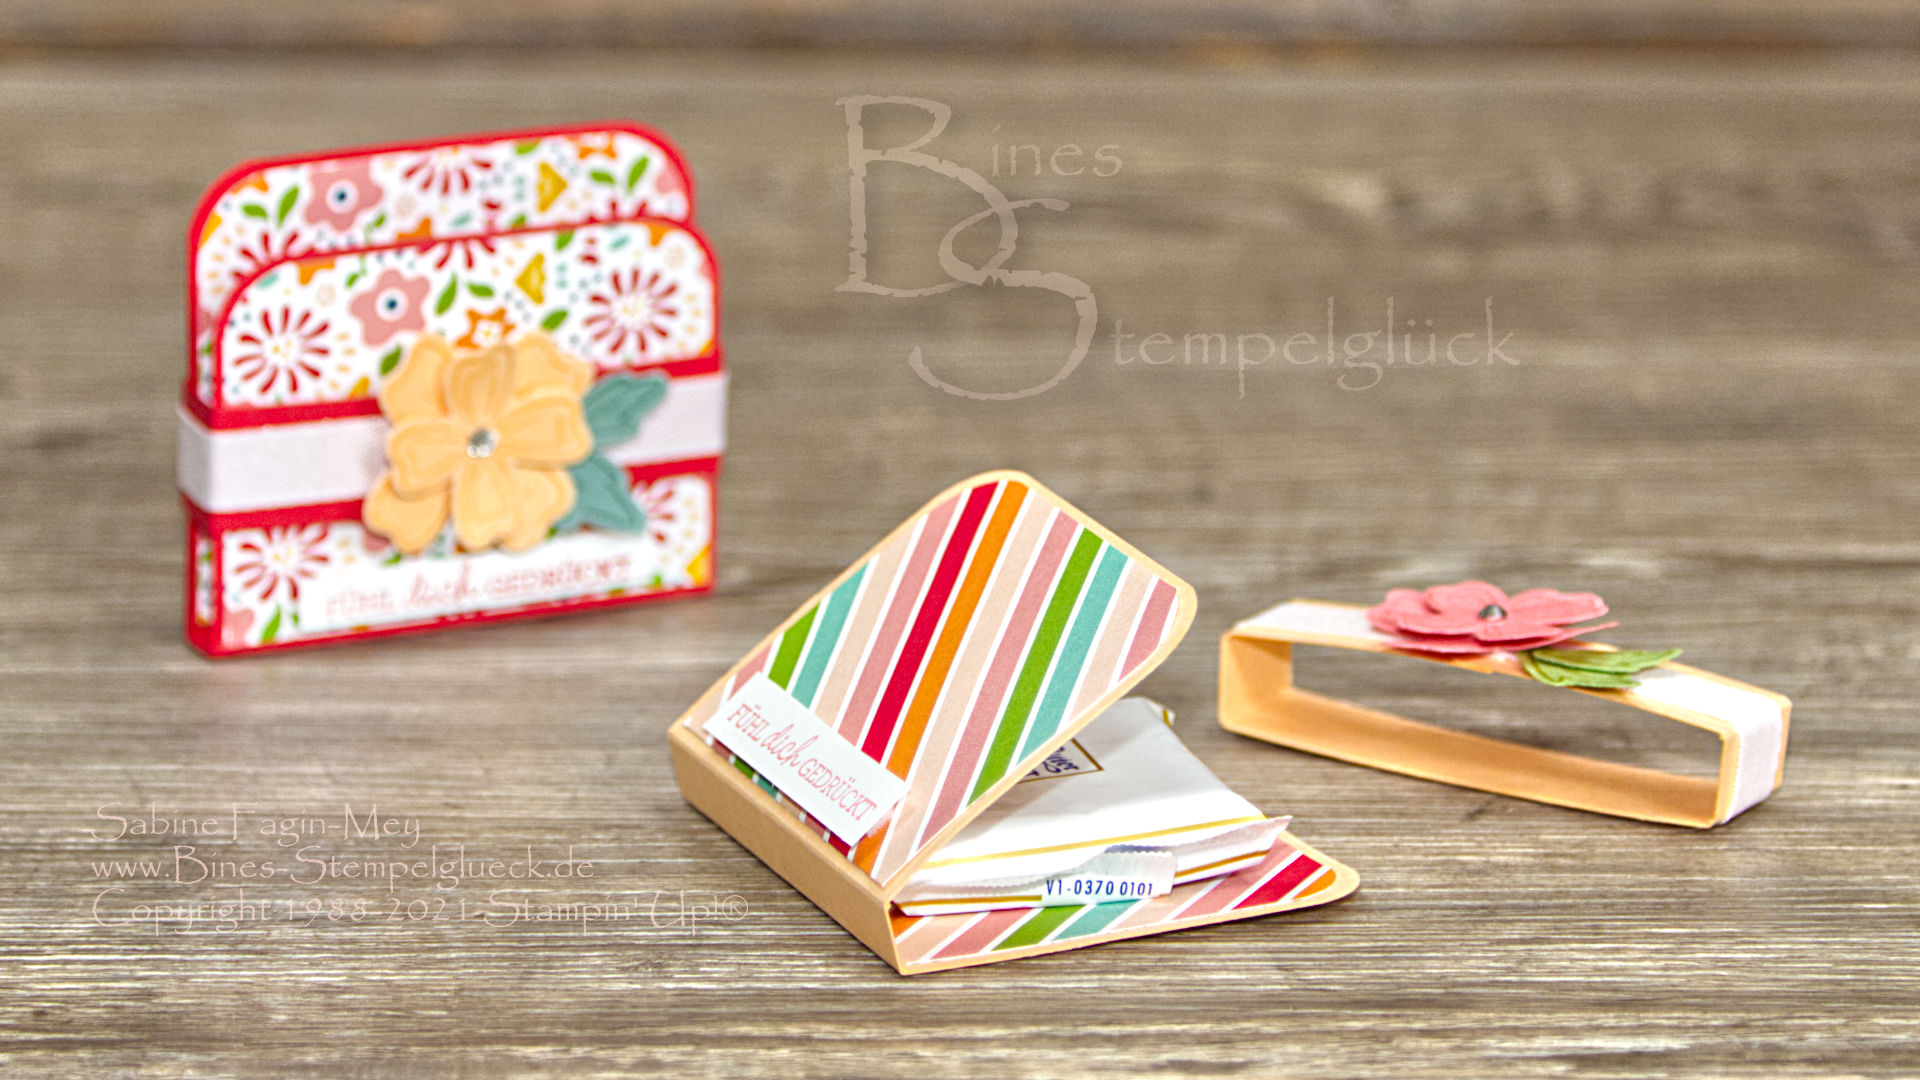 Farbenfrohes Goodie selbst basteln mit Stampin' Up!